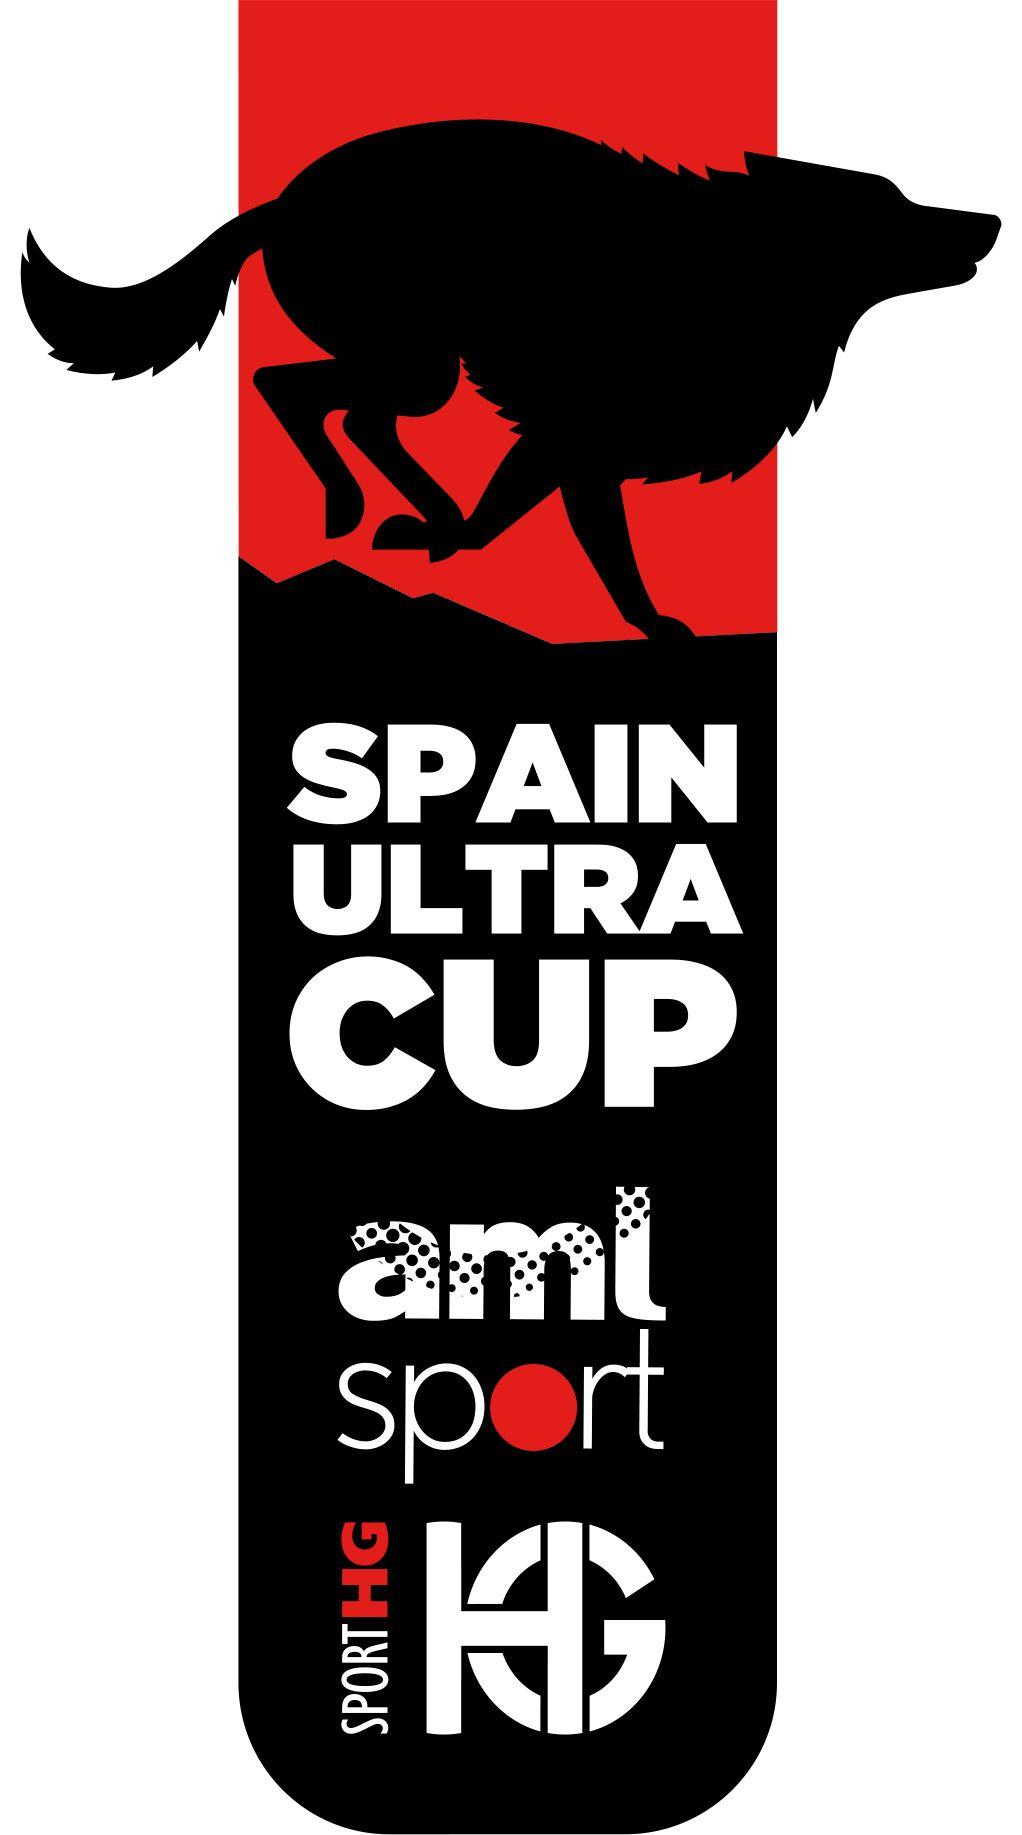 spain-ultra-cup-aml-sport-hg